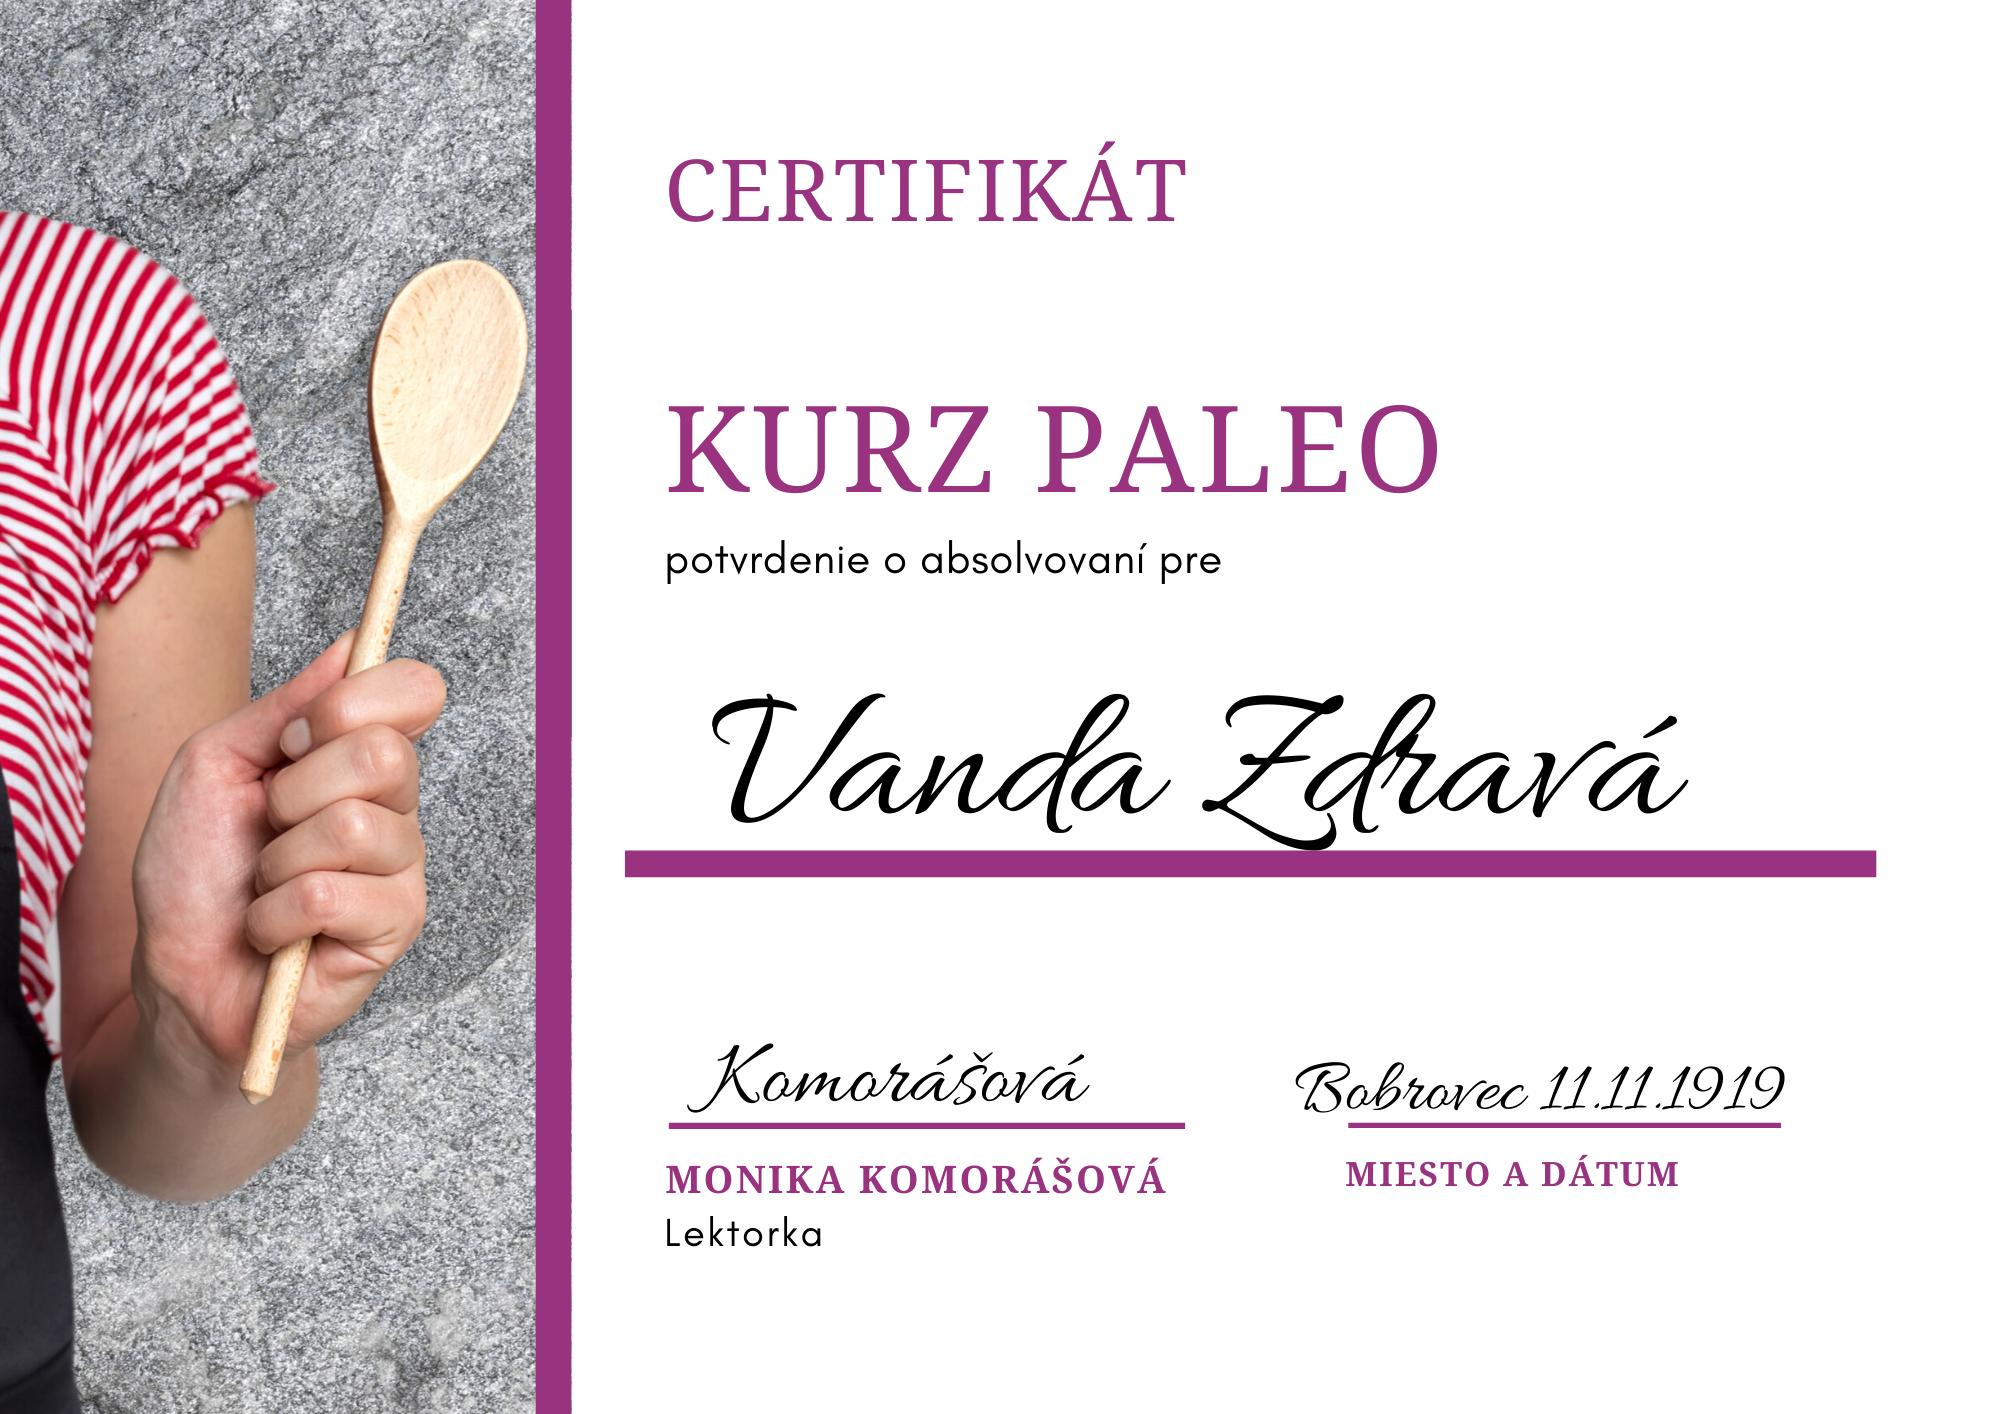 kurz paleo - certifikát